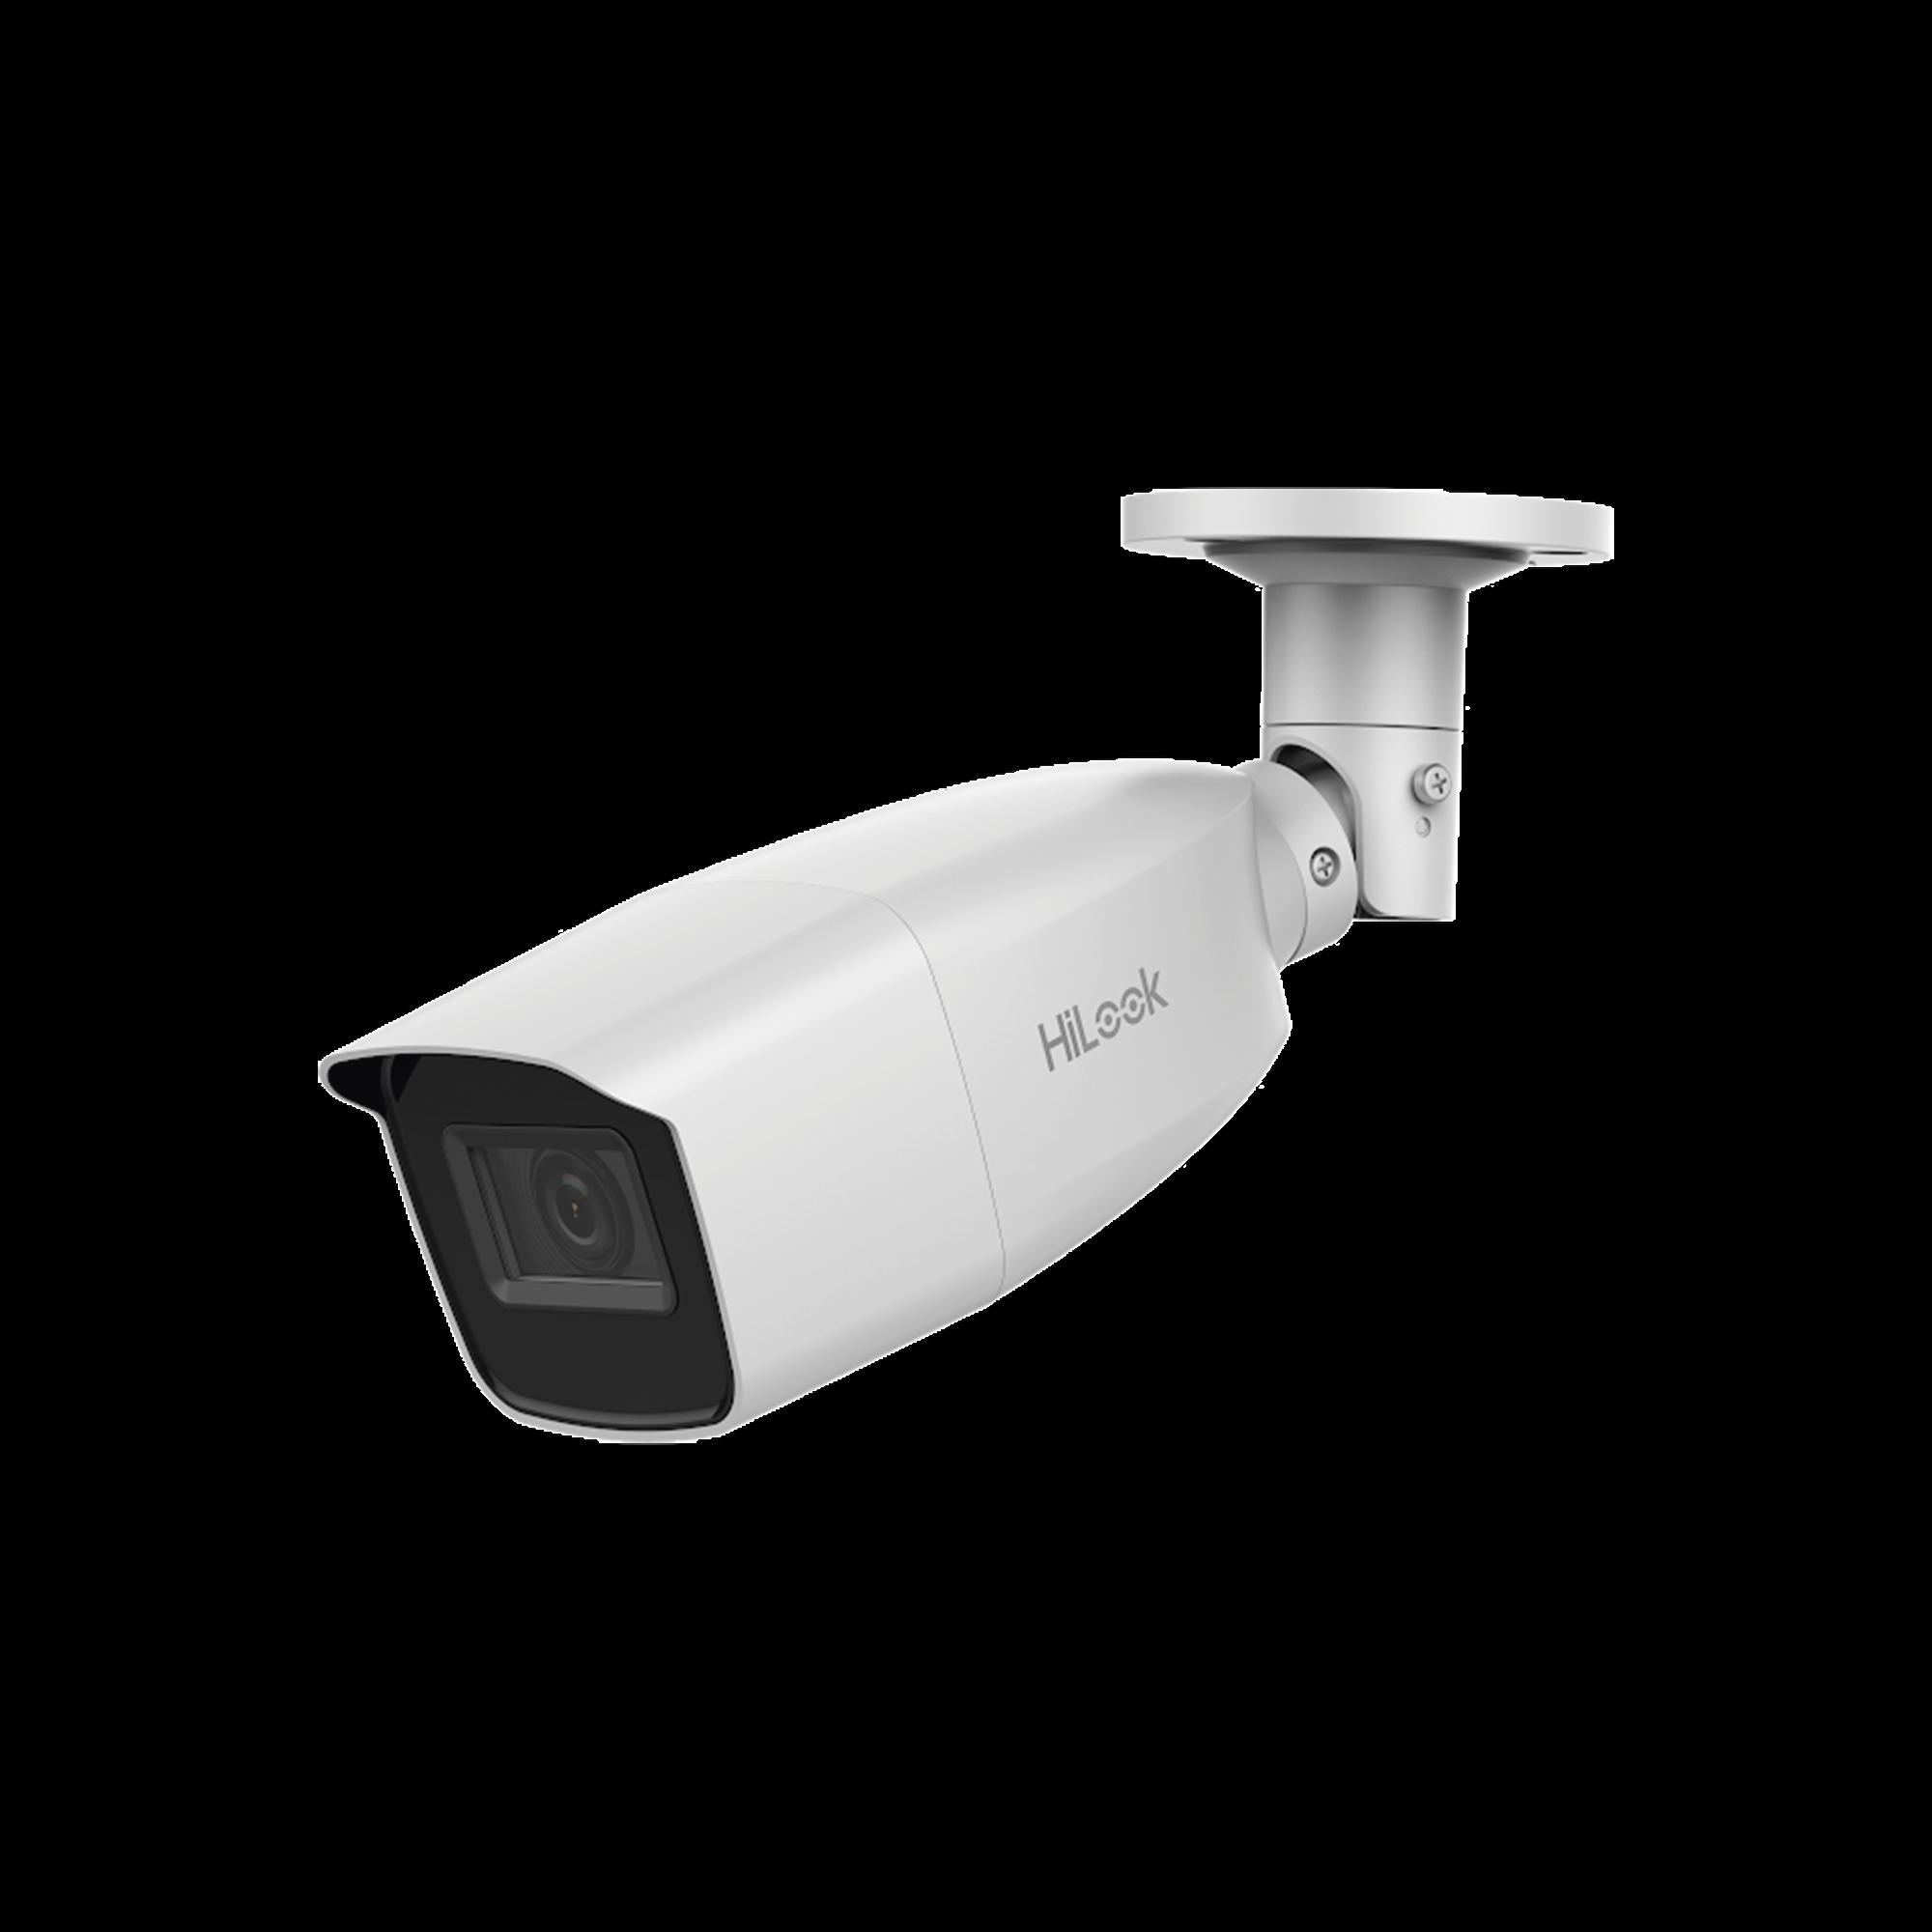 Bala TURBOHD 4 Megapixel / Lente Manual  2.8 - 12 mm / 40 mts IR EXIR / Exterior IP66 / 4 Tecnologias (TVI / AHD / CVI / CVBS) / dWDR